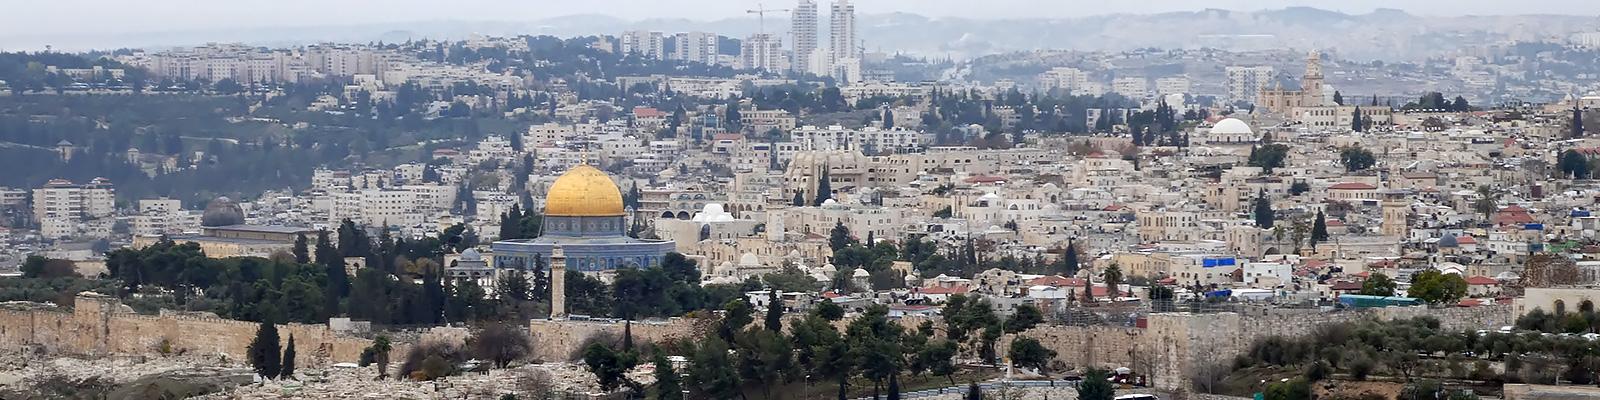 Jerusalem旧市街